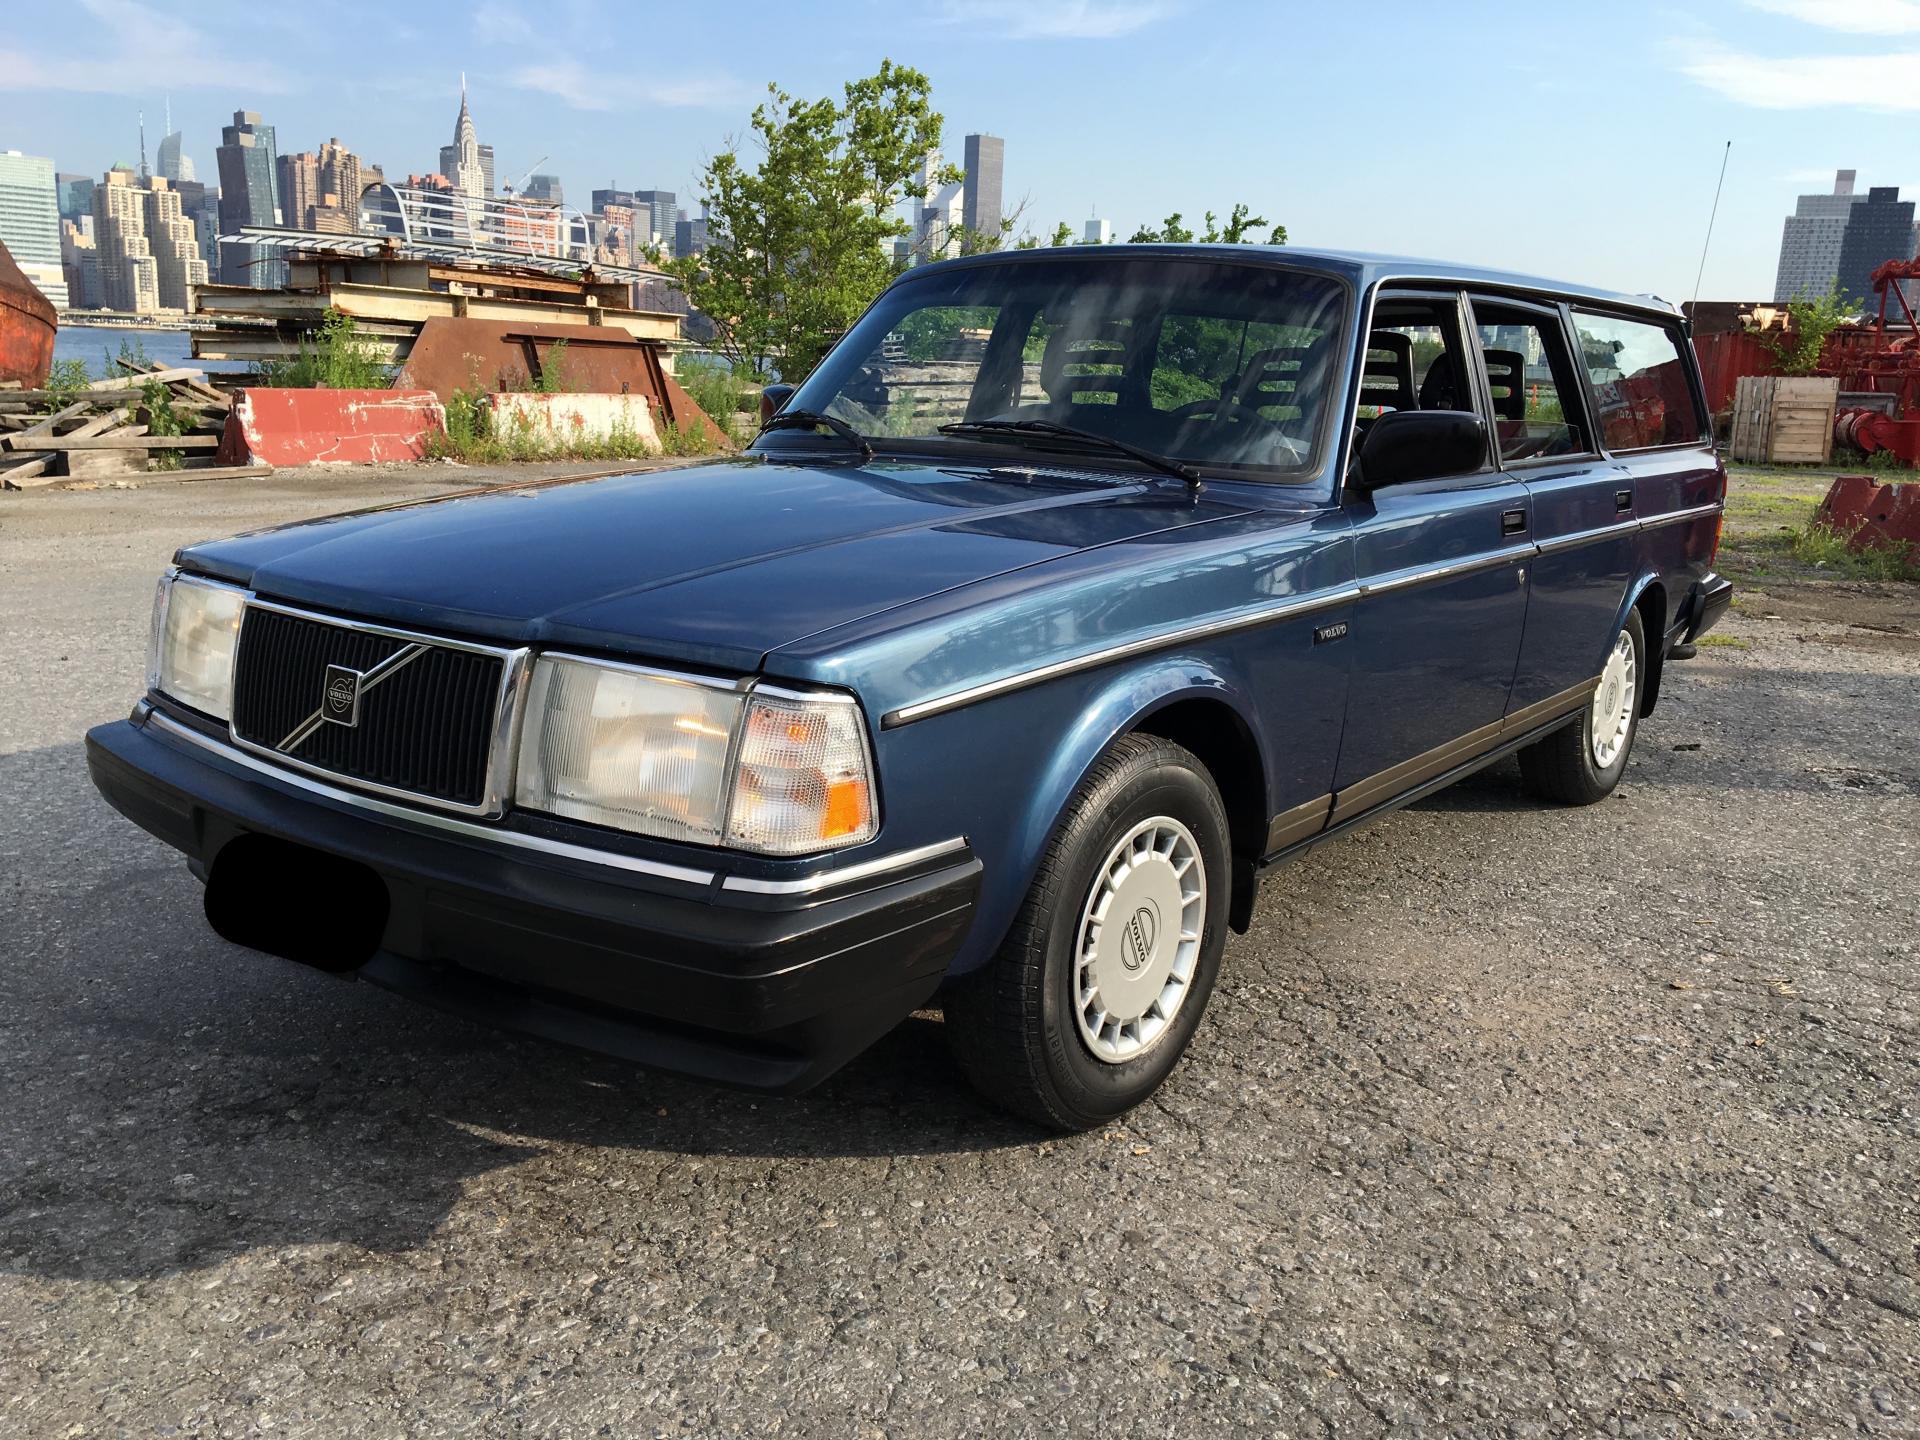 Buy used 1991 Volvo 240 Station Wagon Beautiful Shape, Low ...   1991 Volvo 240 Wagon